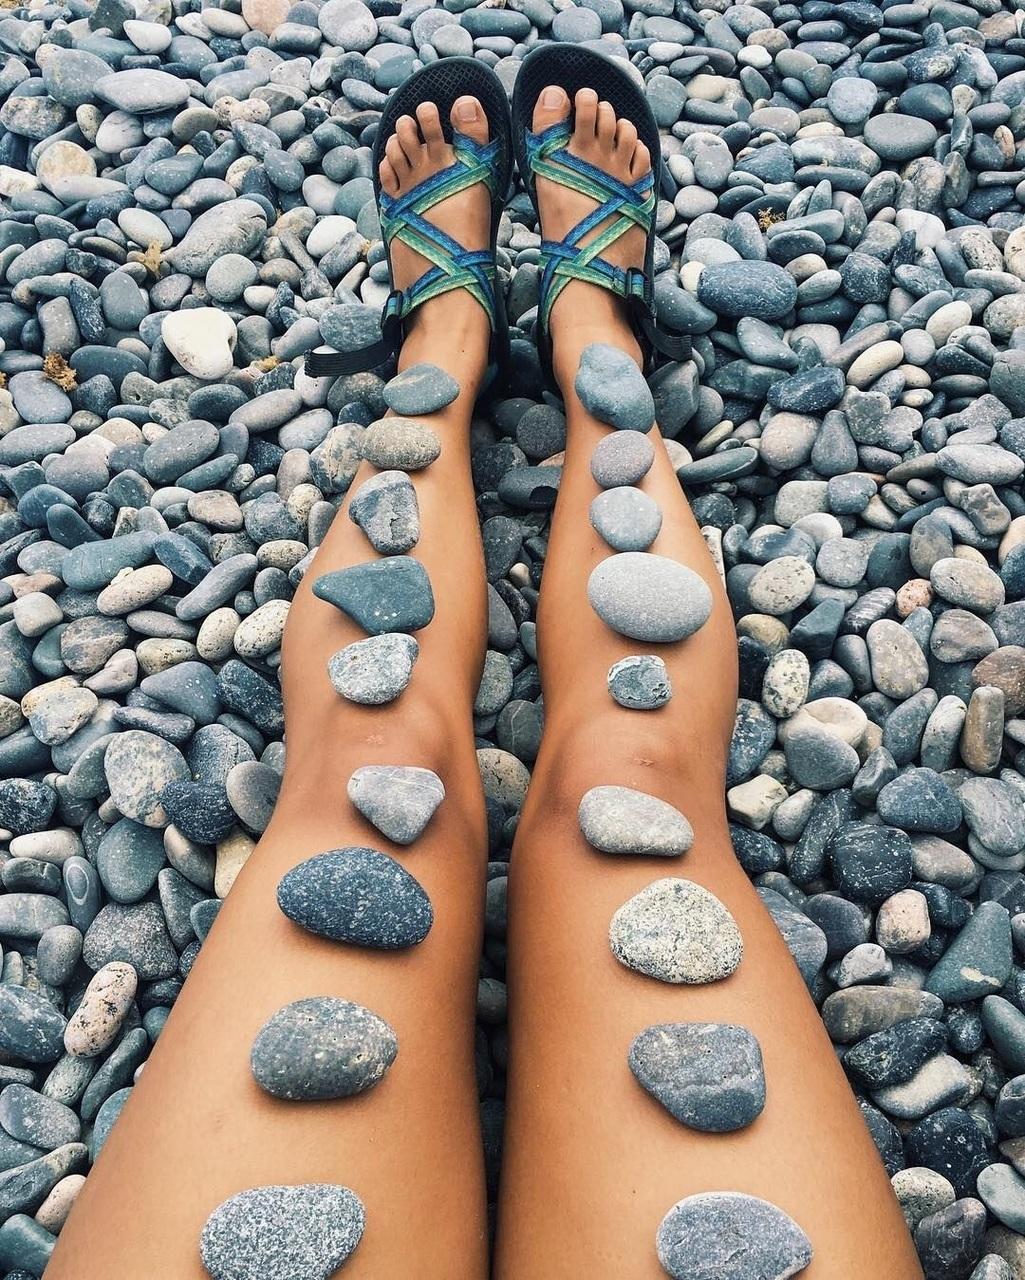 rocks and legs image